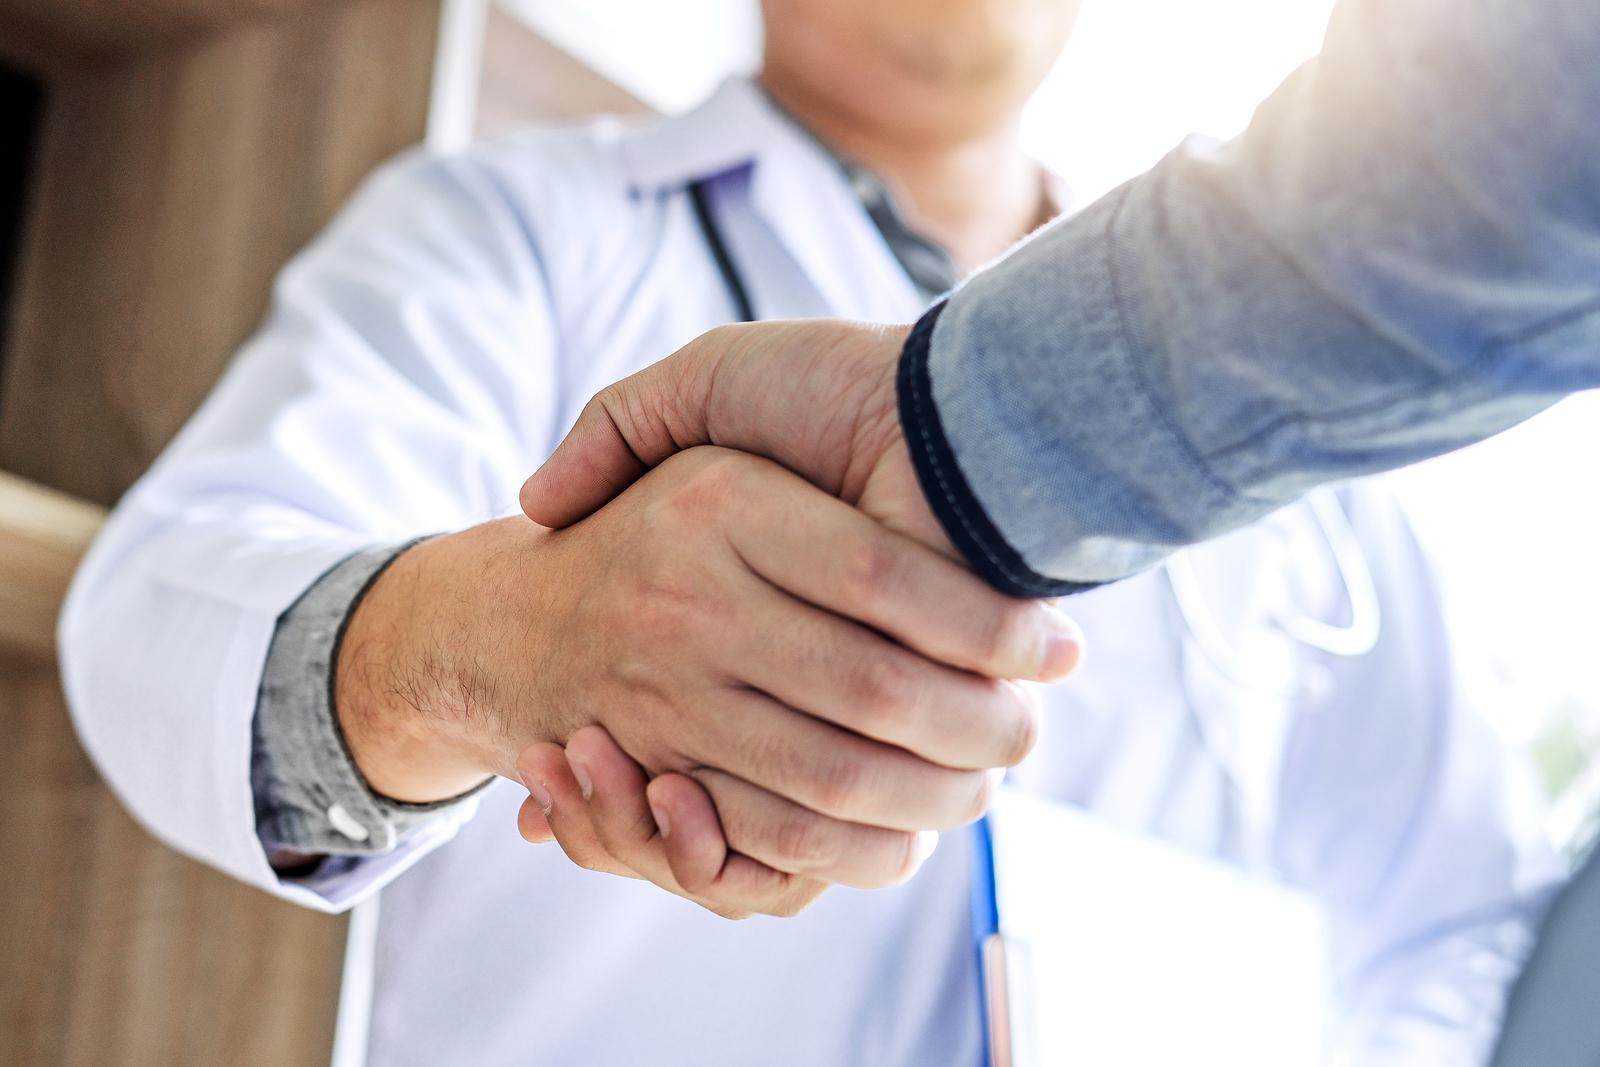 bigstock-Medicine-And-Health-Care-Conce-252080623.jpg